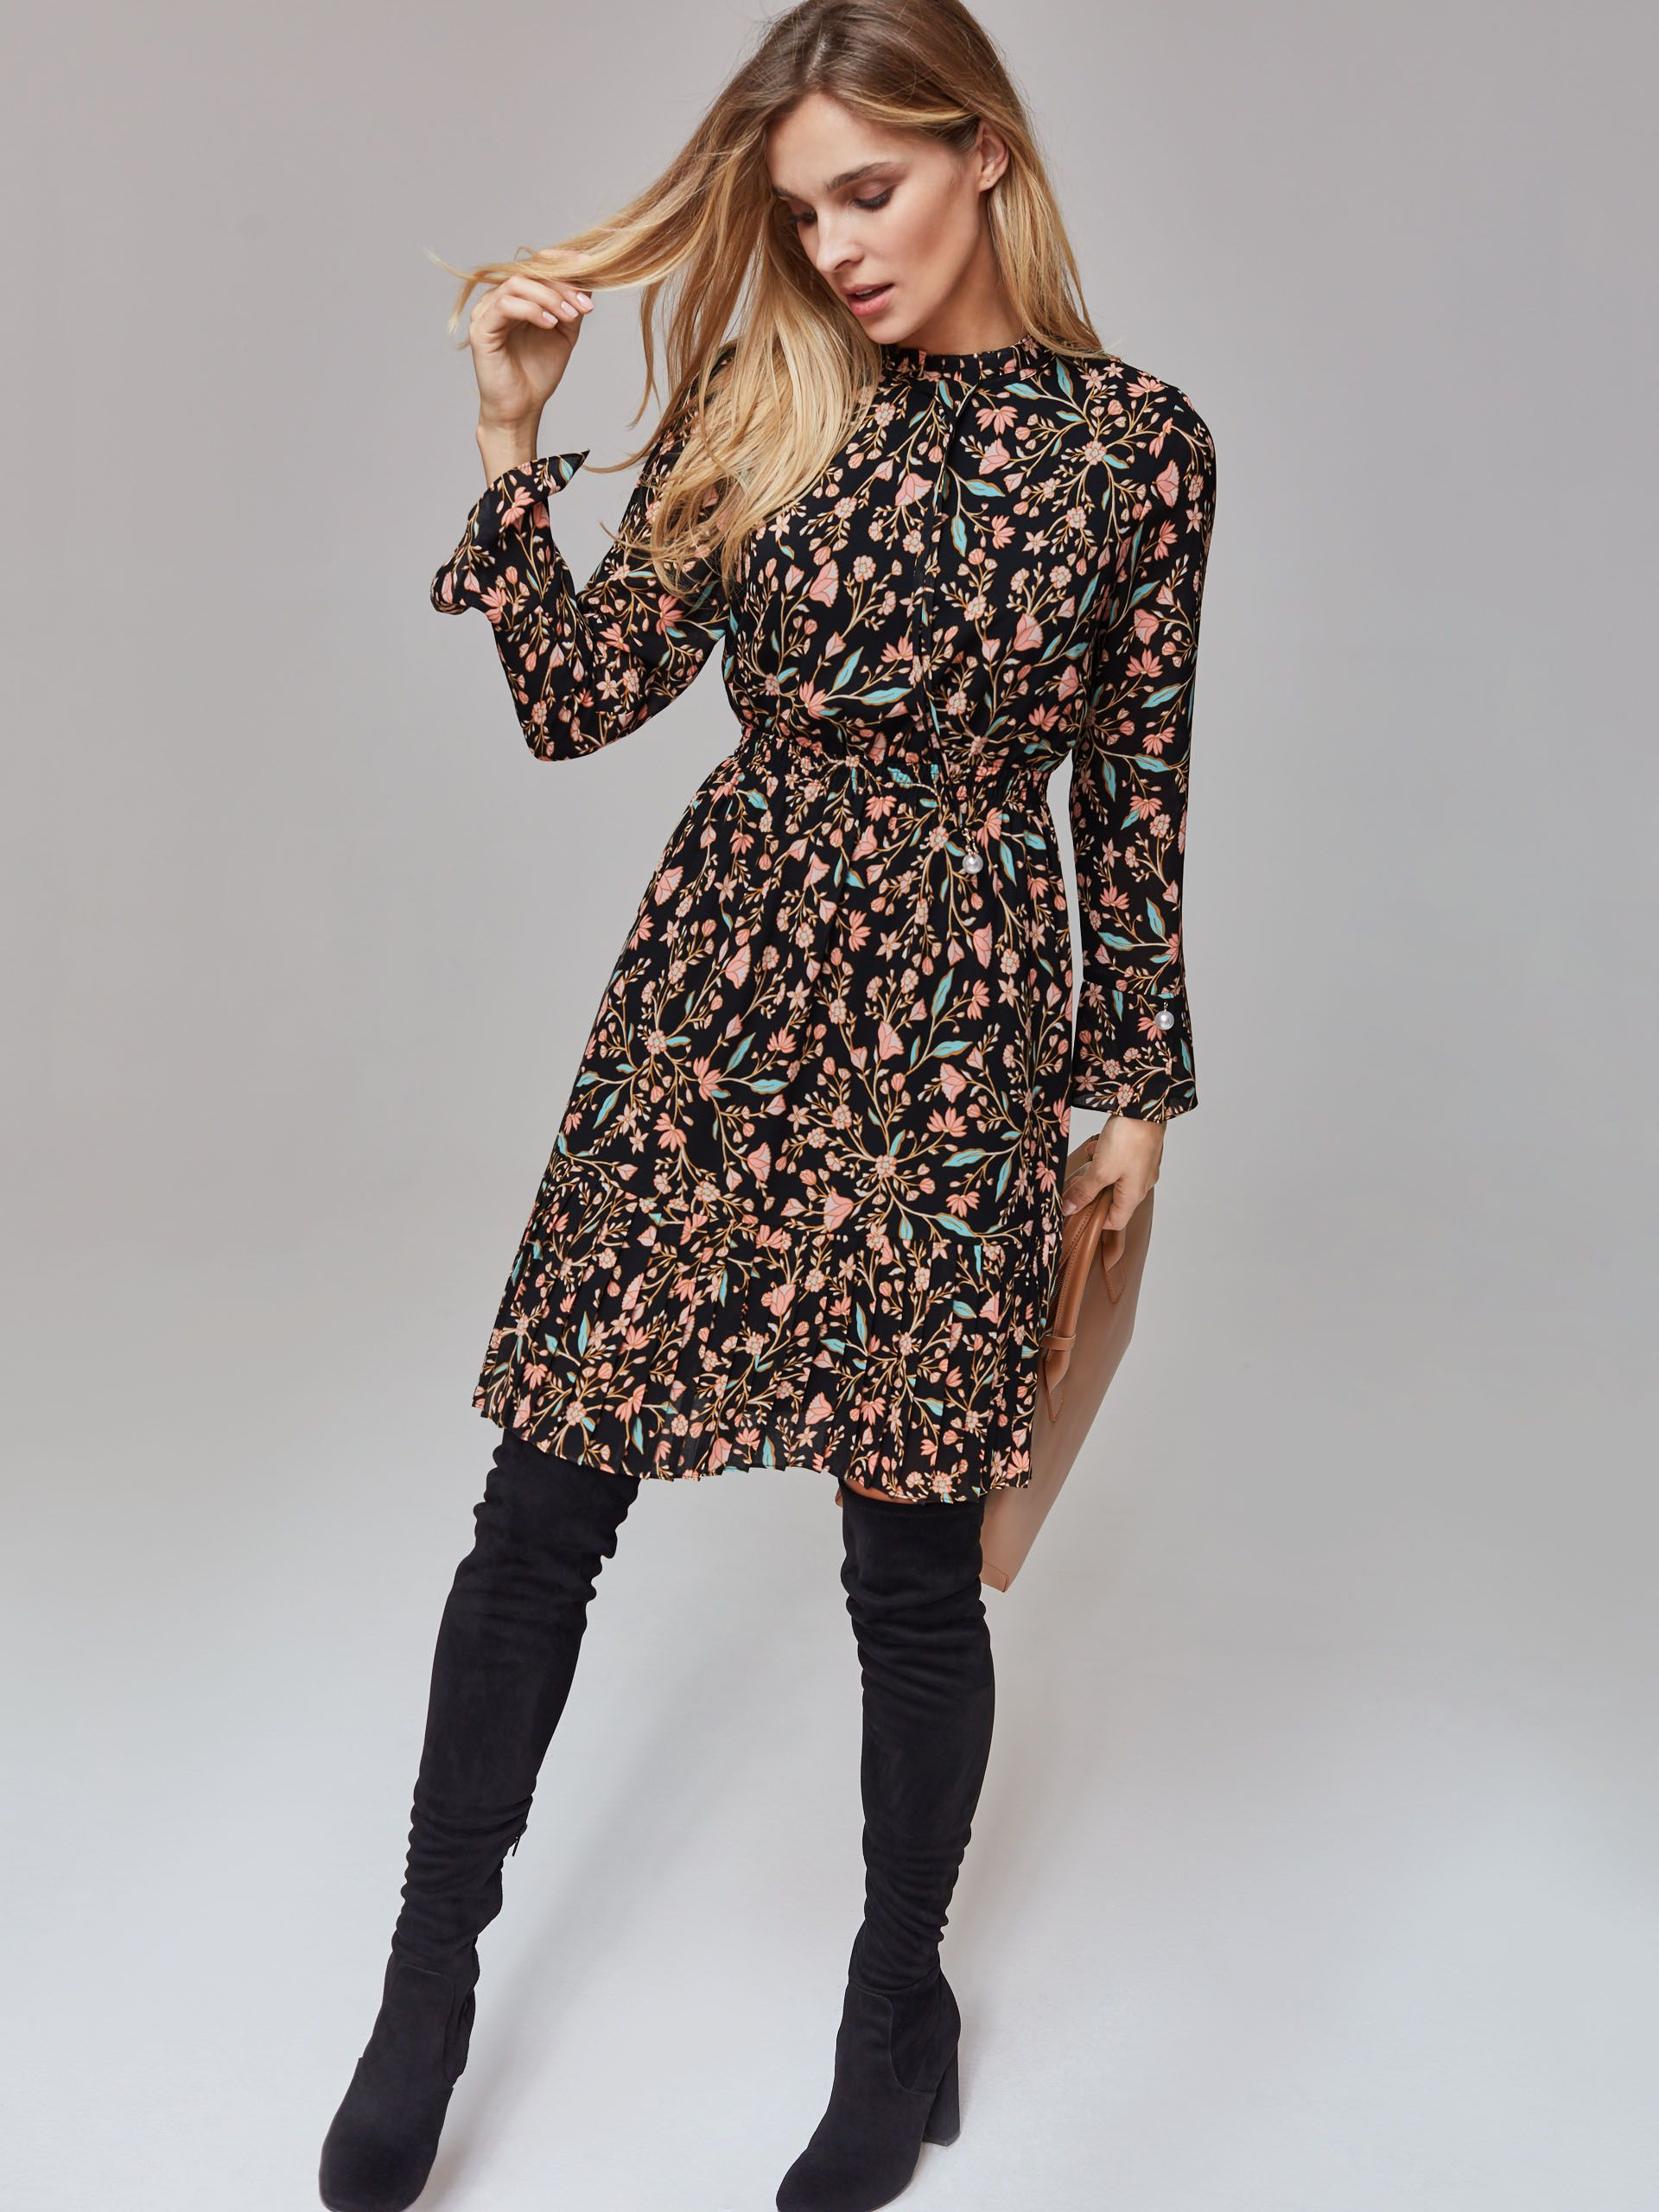 Taranko Aw 2018 19 Autumn Aesthetic Sheer Floral Dress Dresses Sweater Dress